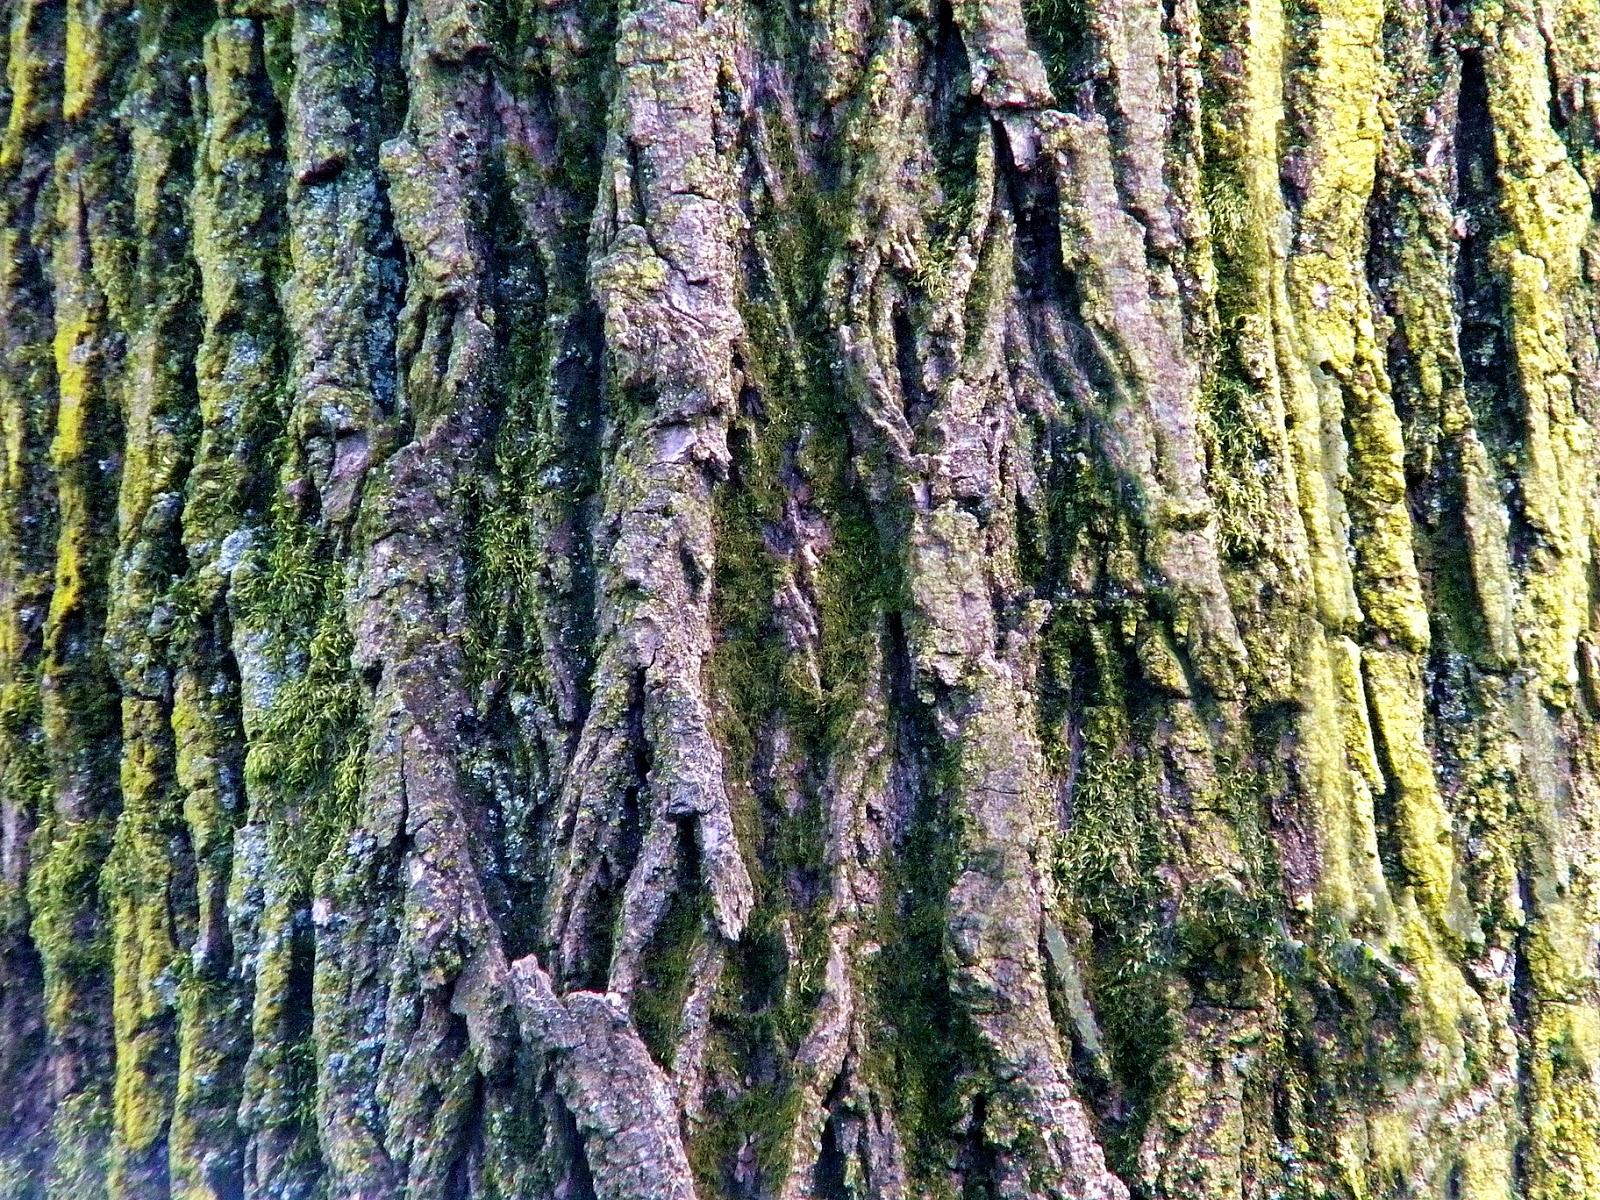 Trees in new york clipart jpg free Tree Bark Clip Art Public Domain Clip Art Photos and Images jpg free